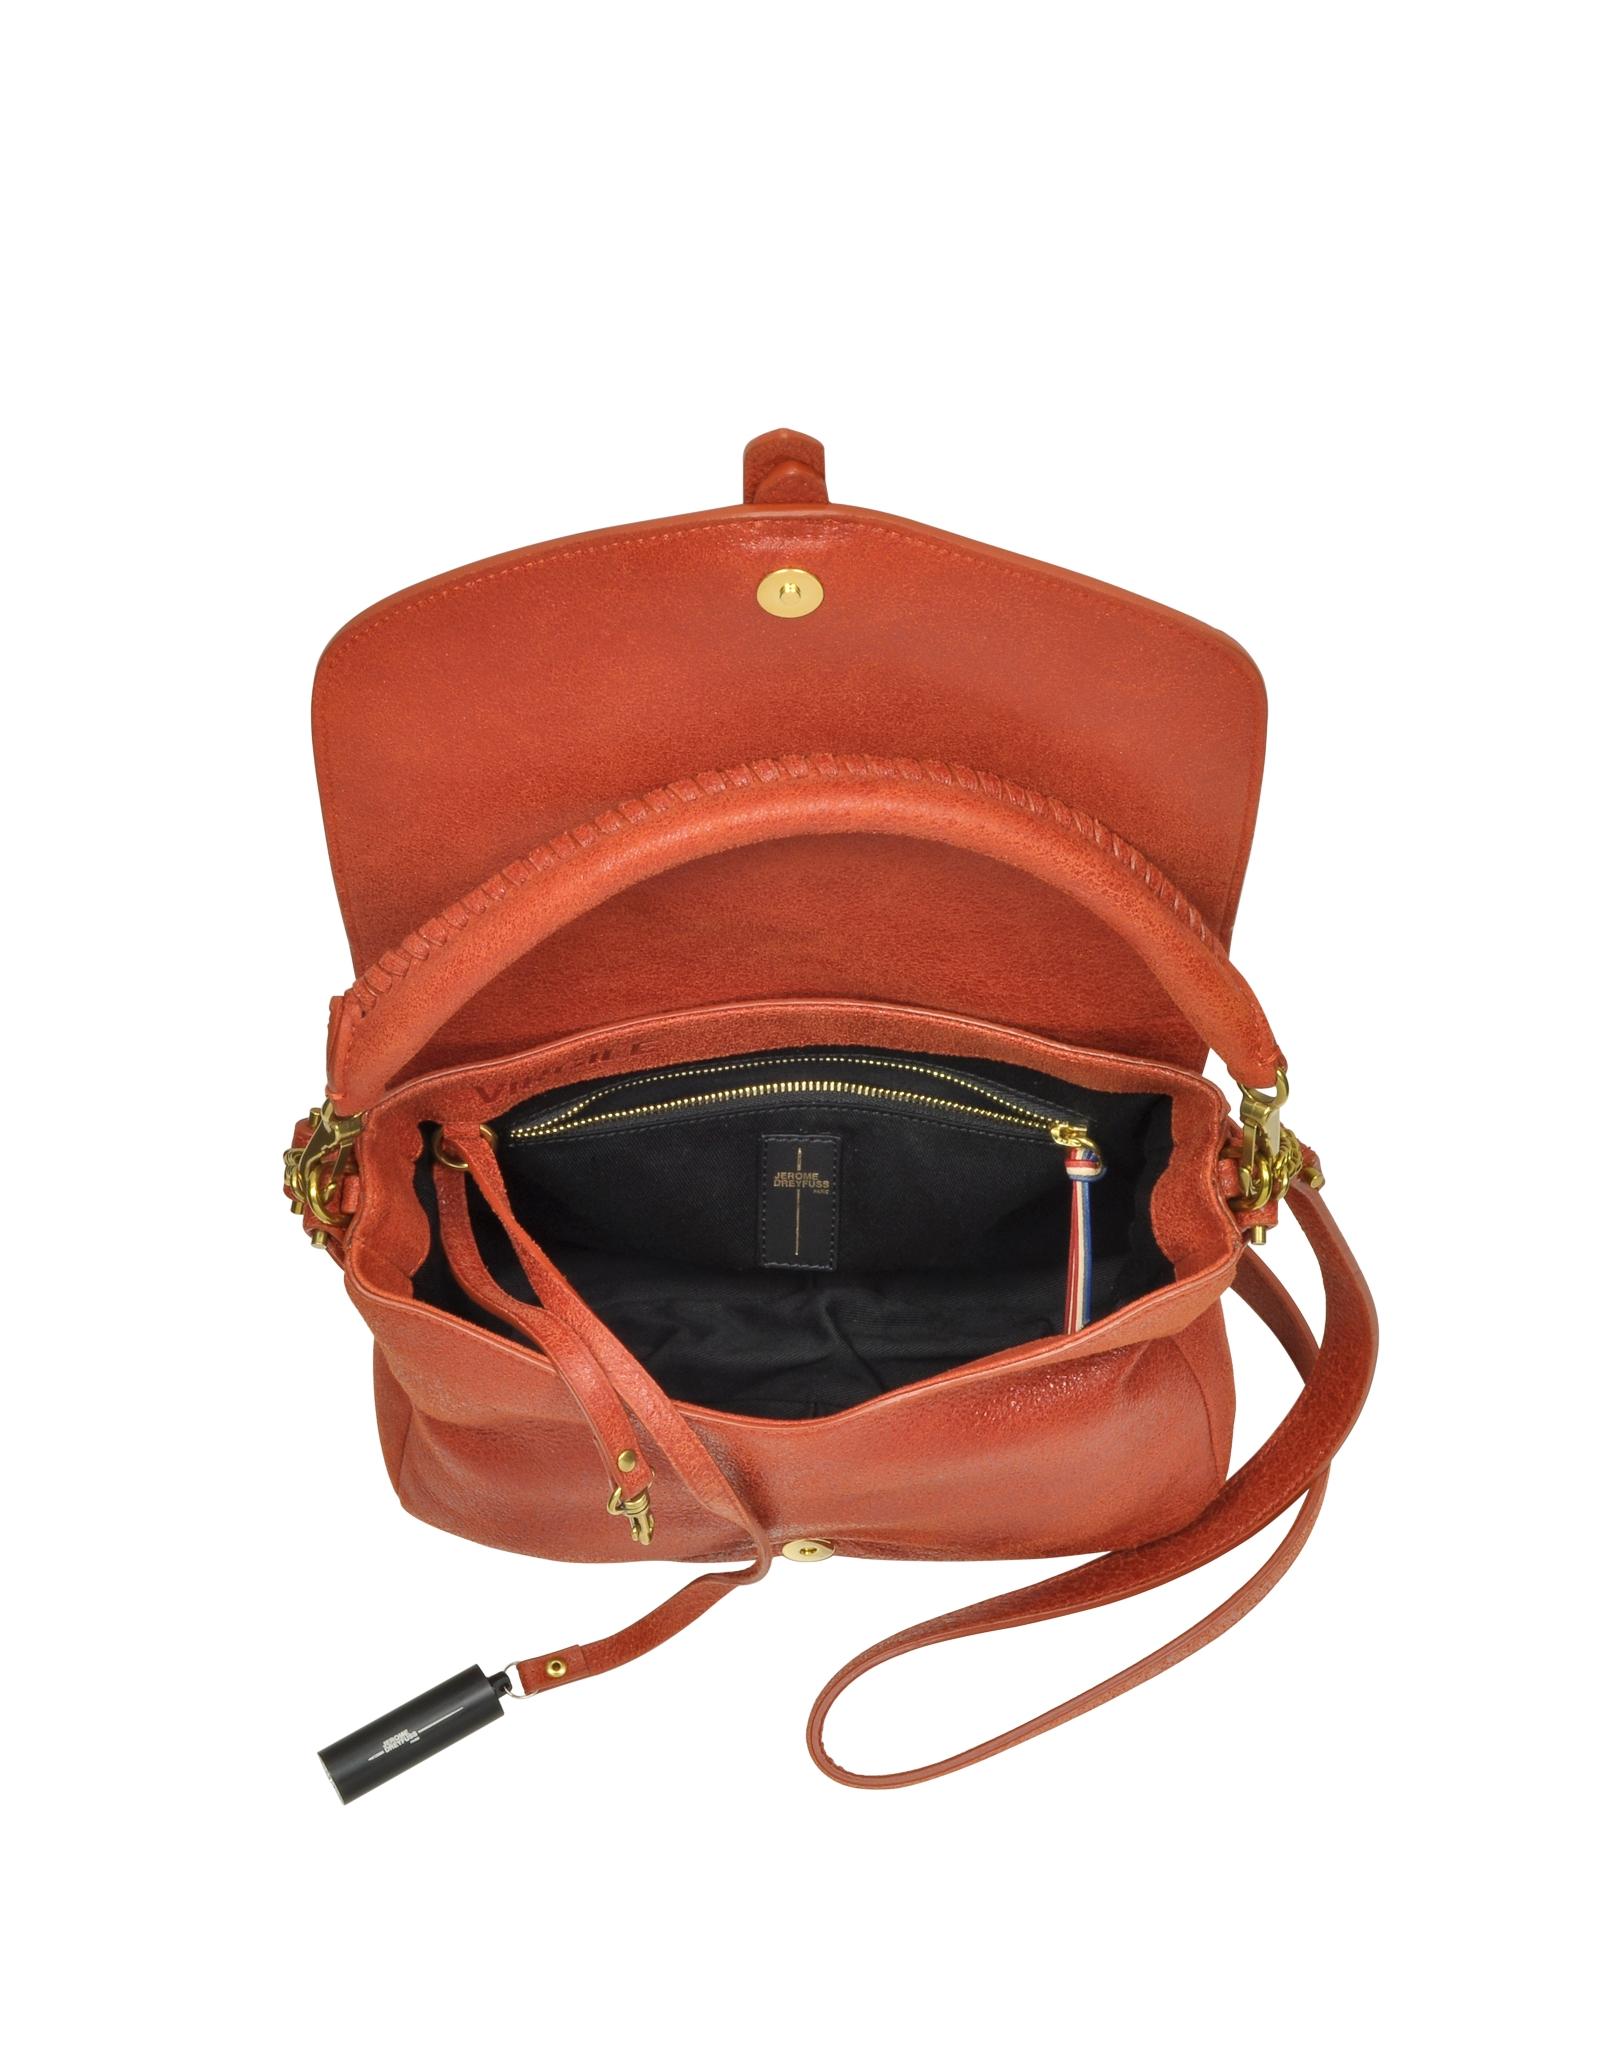 J 233 R 244 Me Dreyfuss Virgile Rust Leather Shoulder Bag In Brown